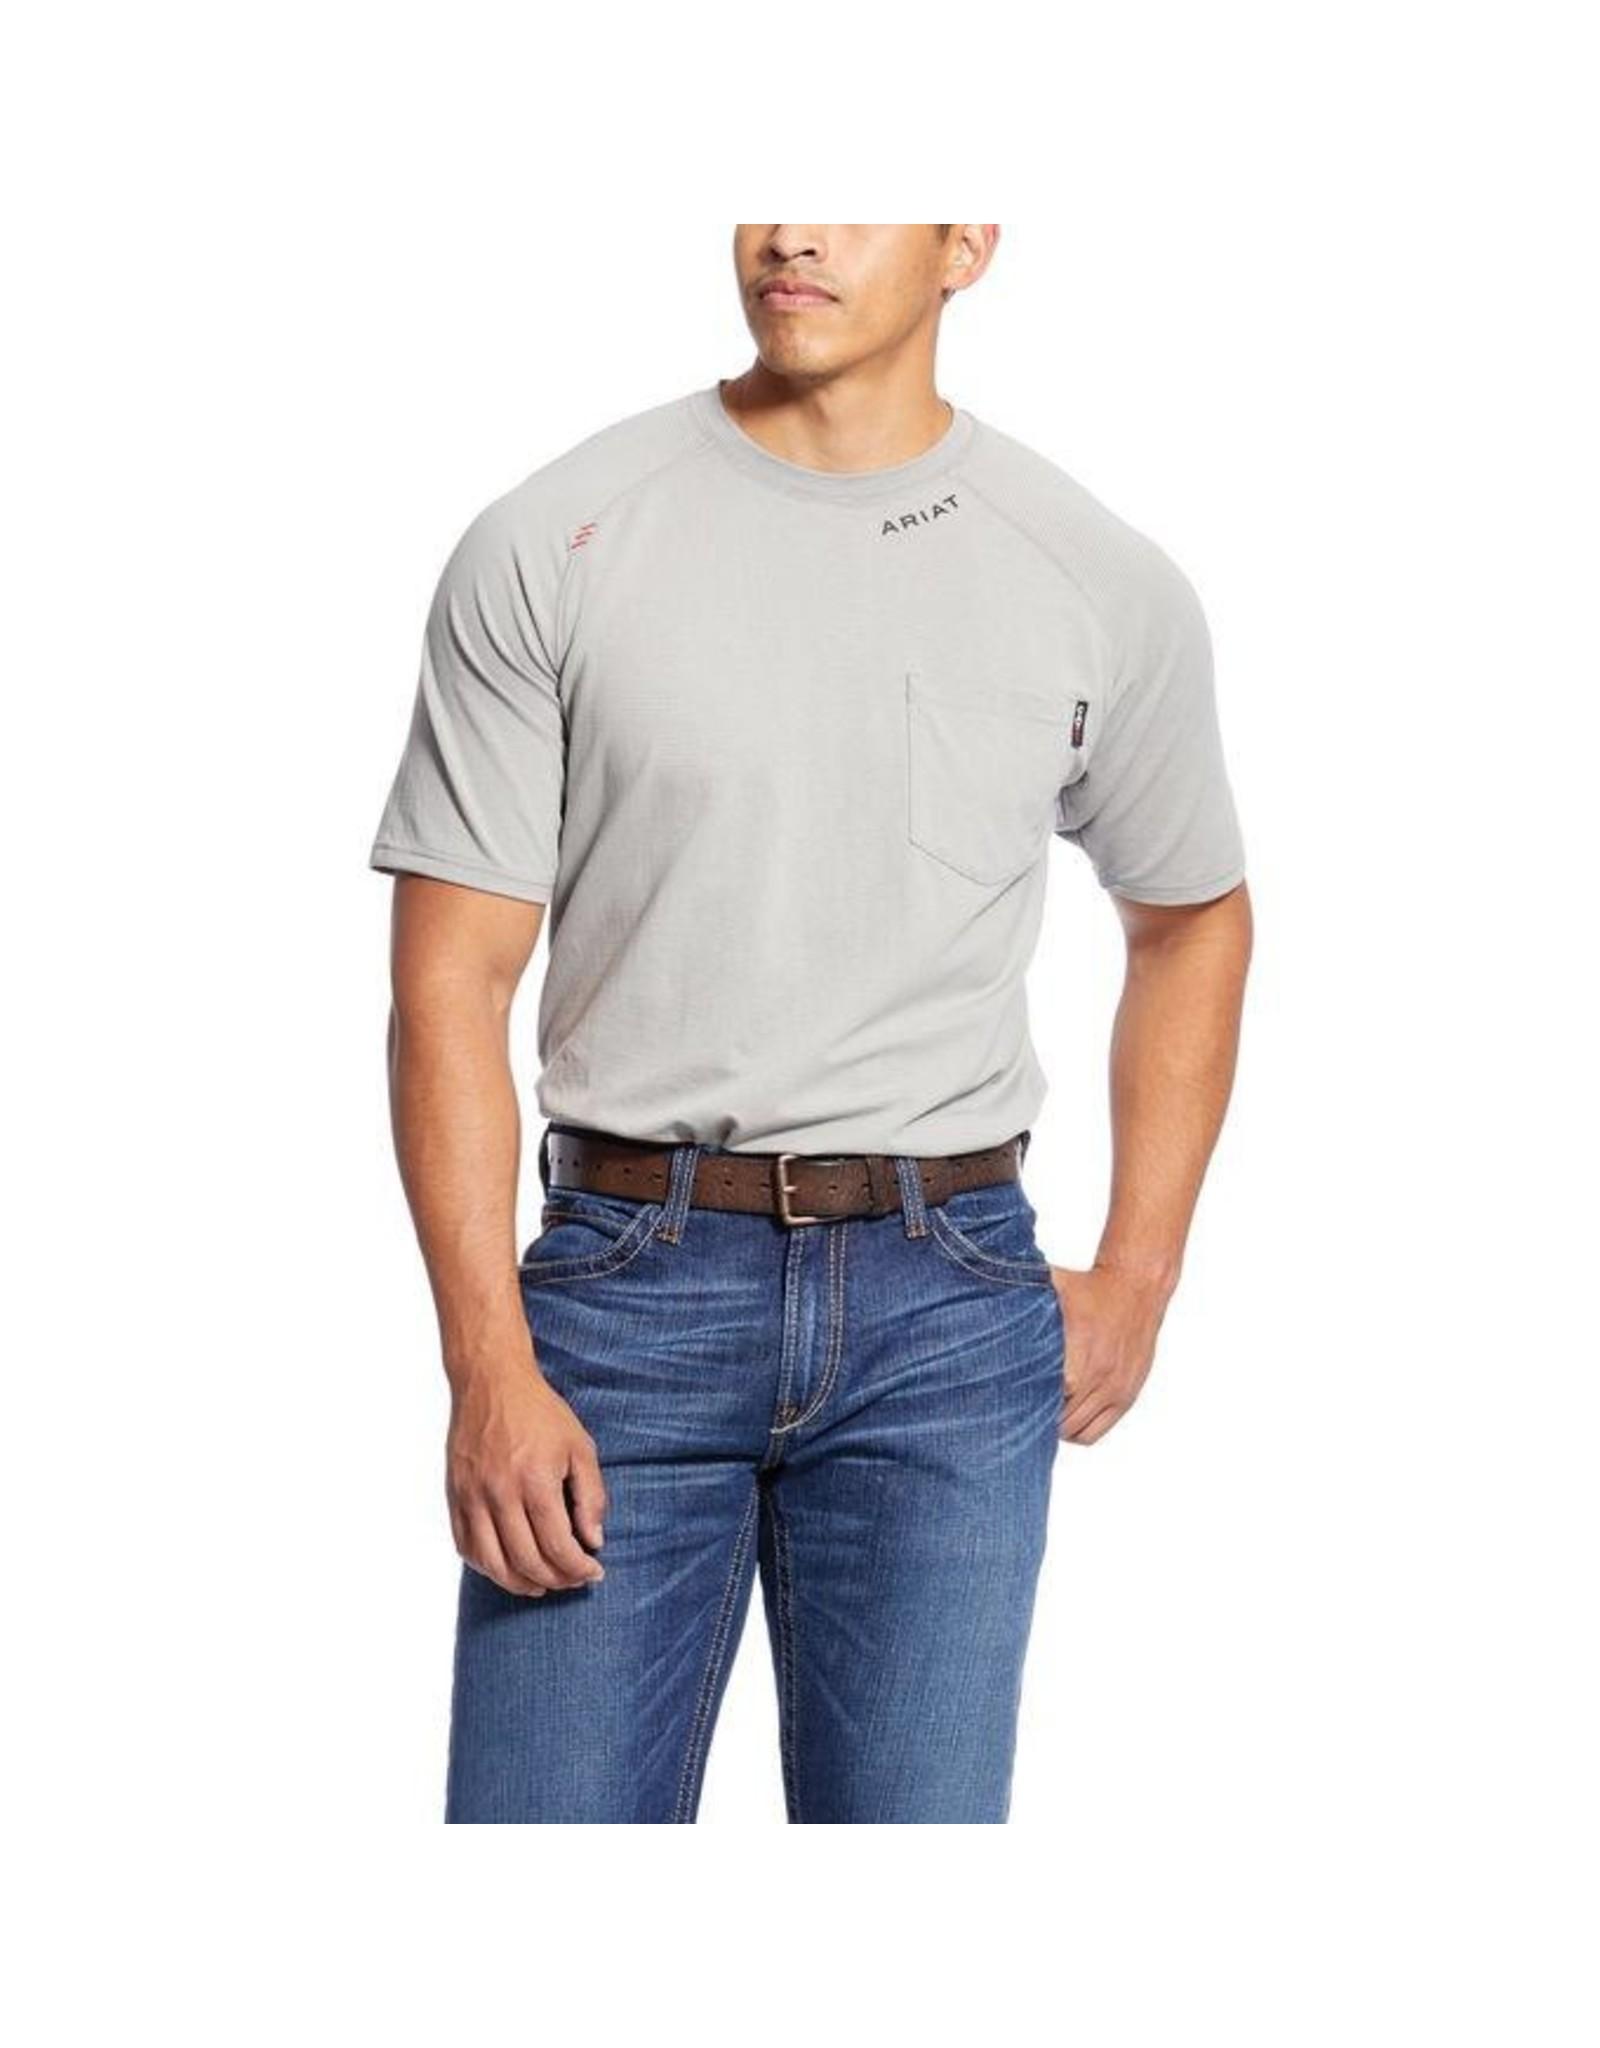 Tops-Men Ariat 10025434<br /> FR Short Sleeve Baselayer